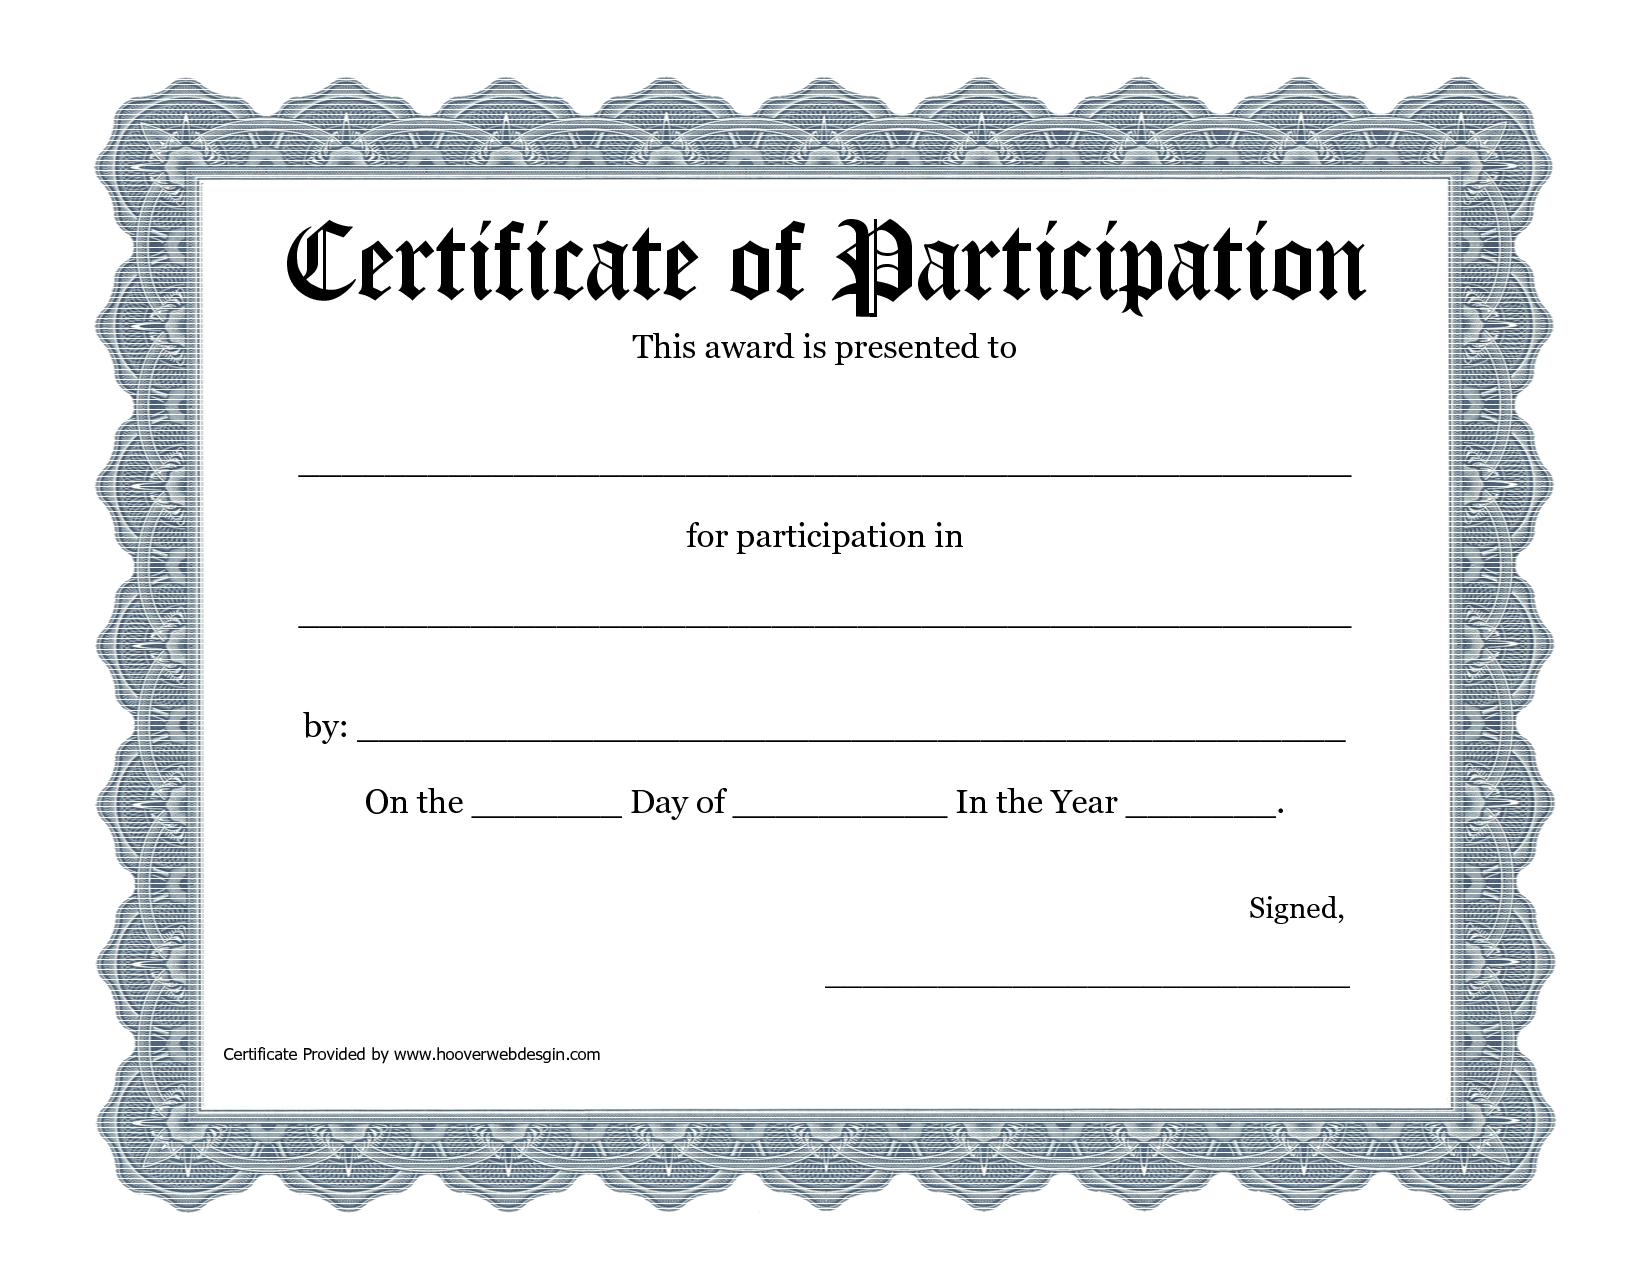 Free Printable Award Certificate Template - Bing Images   2016 Art - Commitment Certificate Free Printable